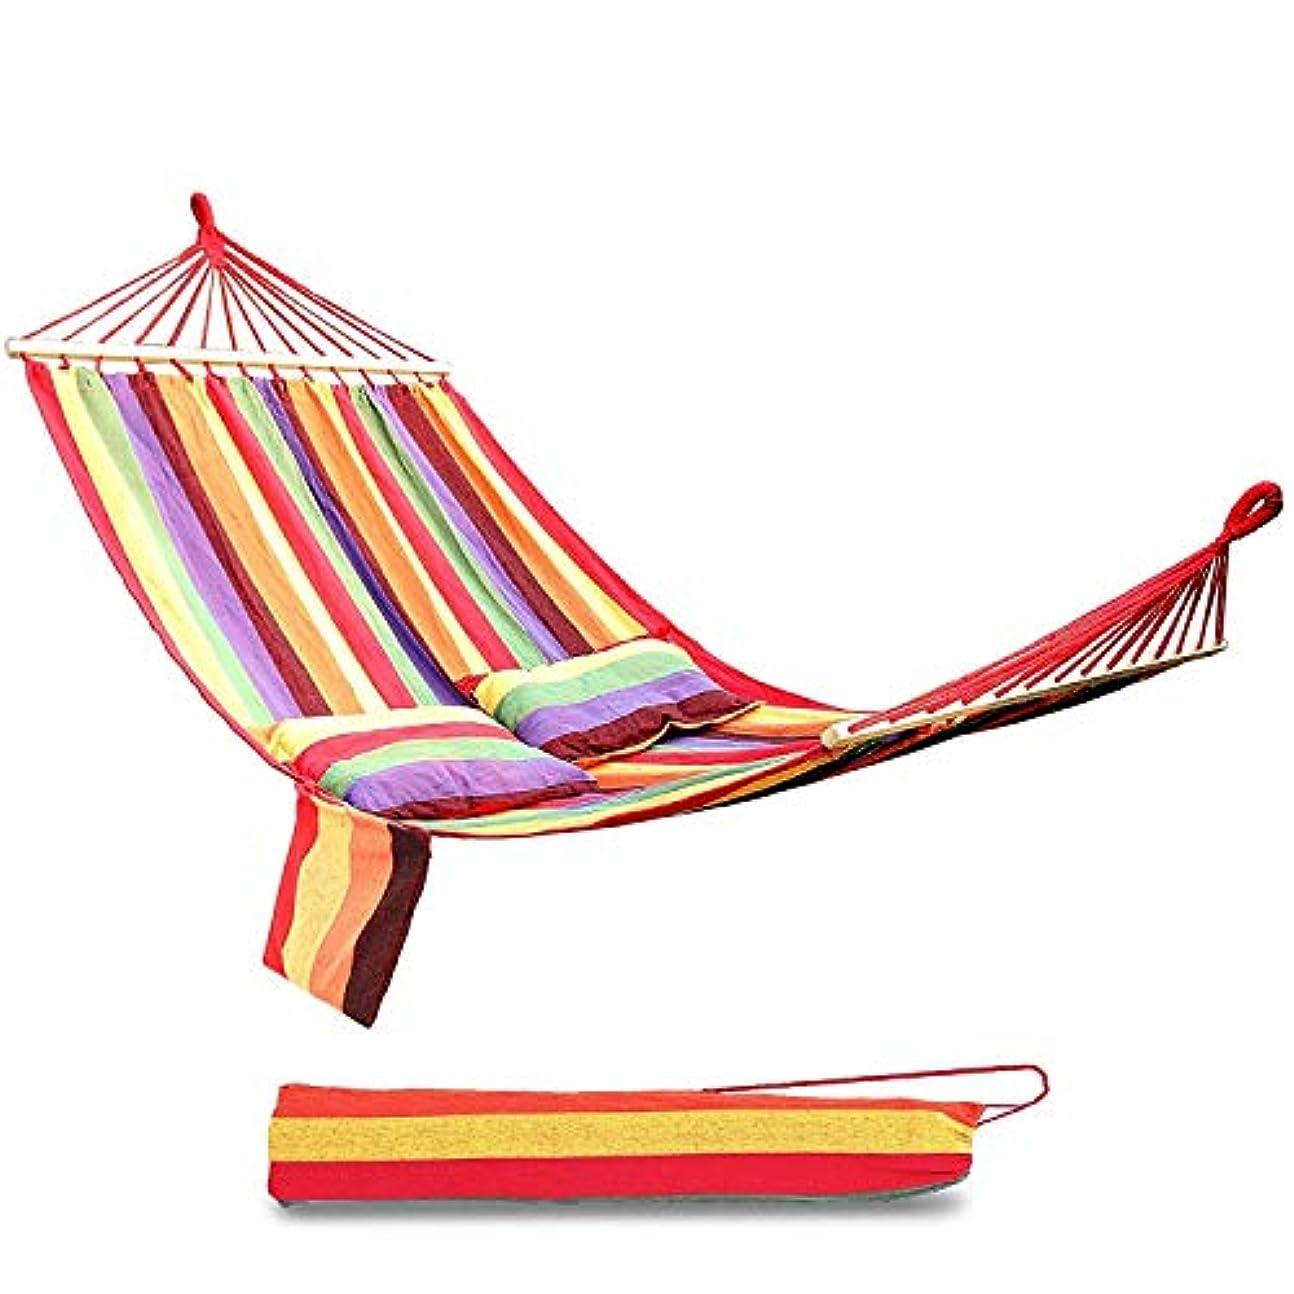 ZAQXSW-dc 屋外のスリングダブルハンモック大人の子供たちの睡眠ネットキャンプチェアクレードルチェアシングルを振る (Color : Rainbow strip)